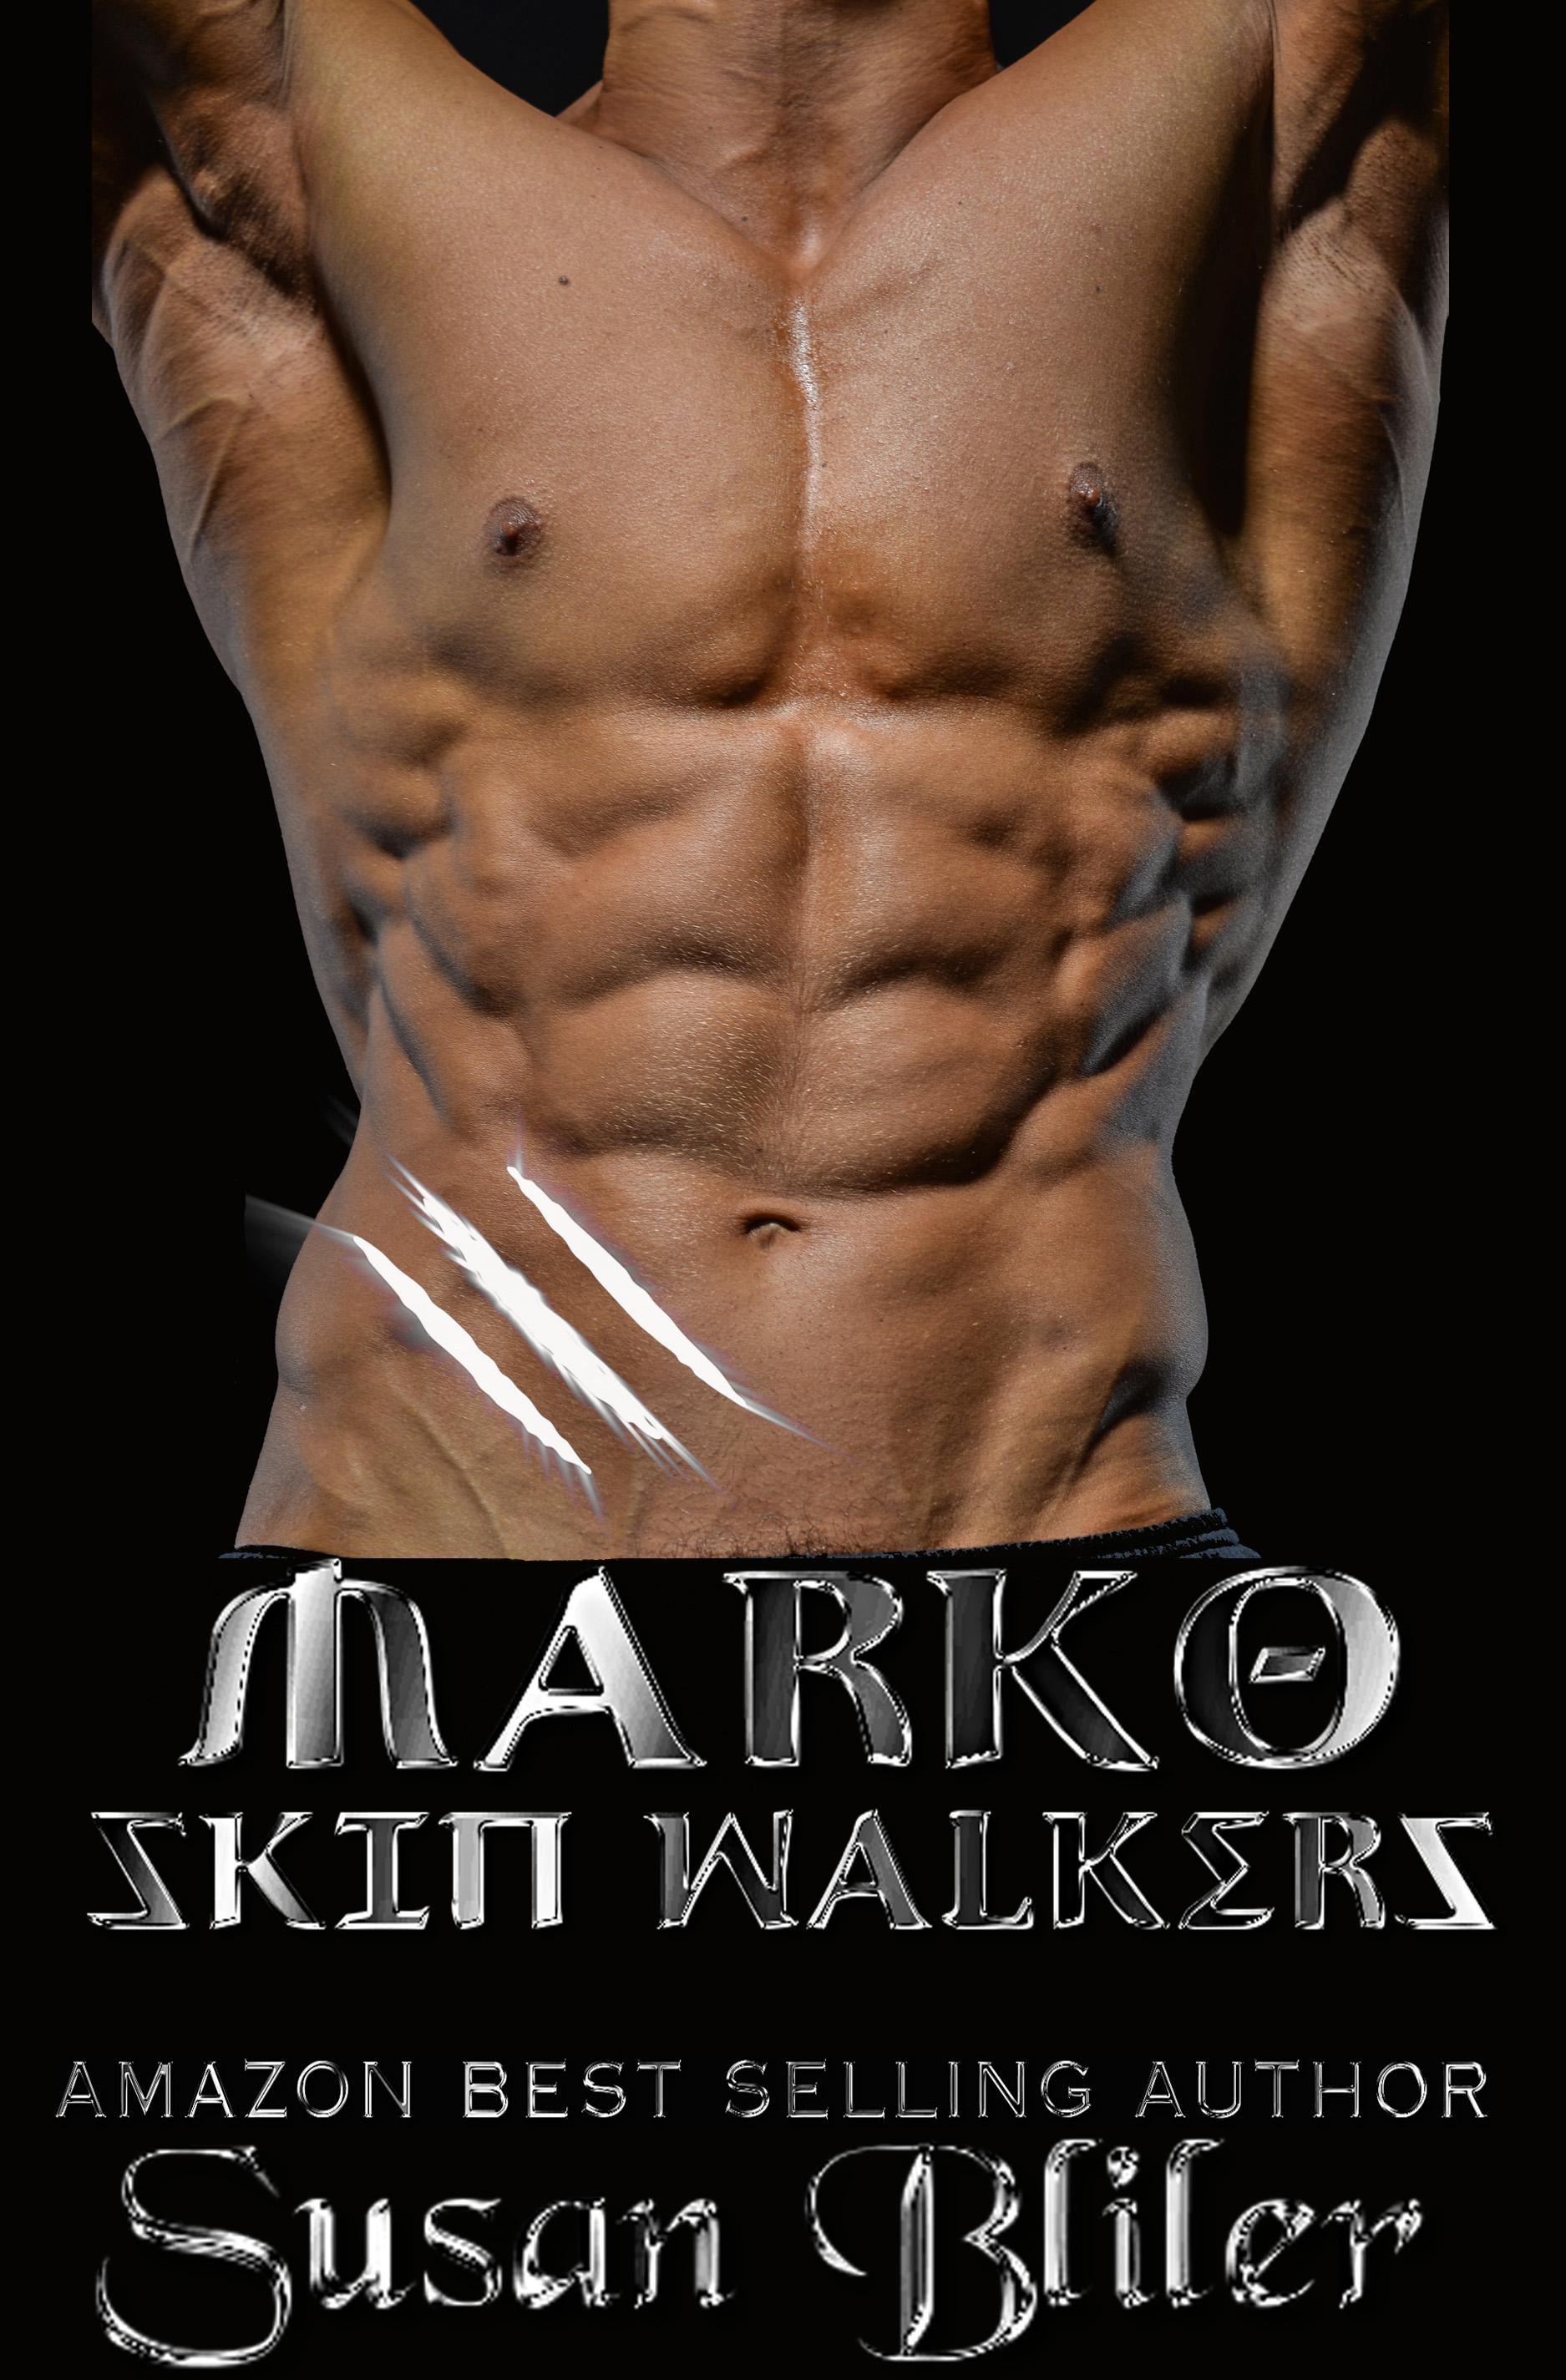 SW: Marko